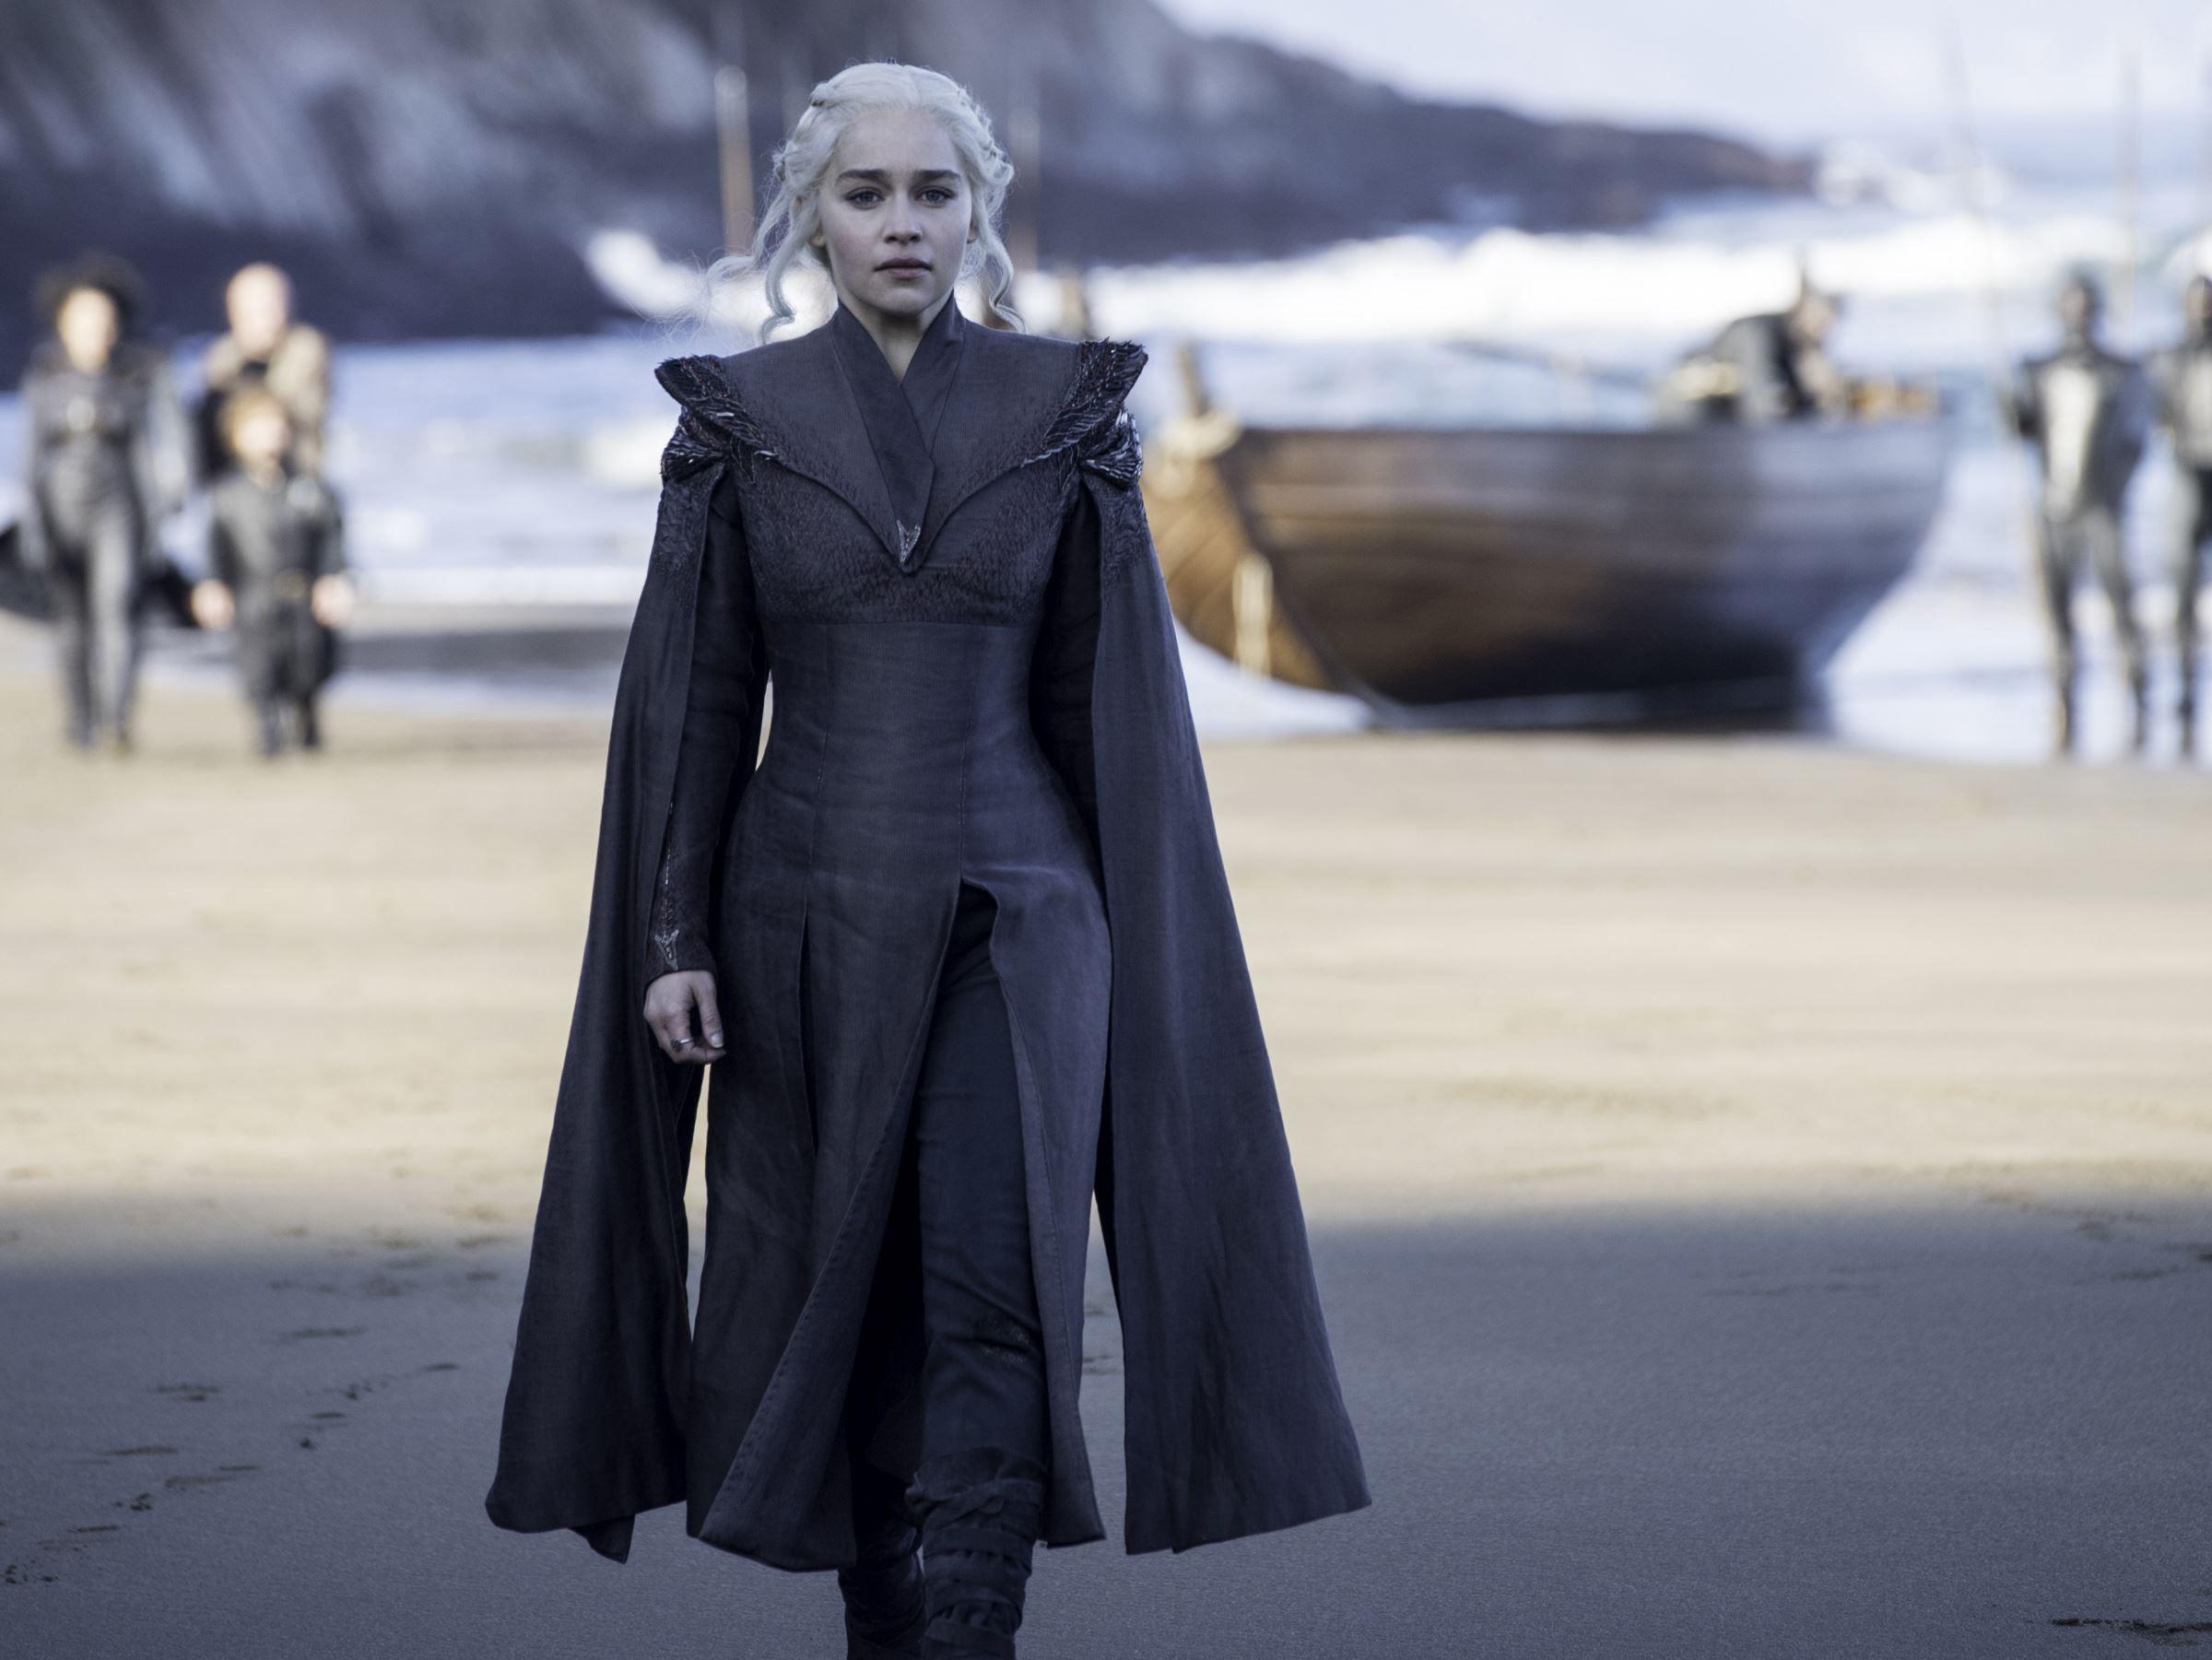 Daenerys Targaryen - Zèbre surdoué ou haut potentiel